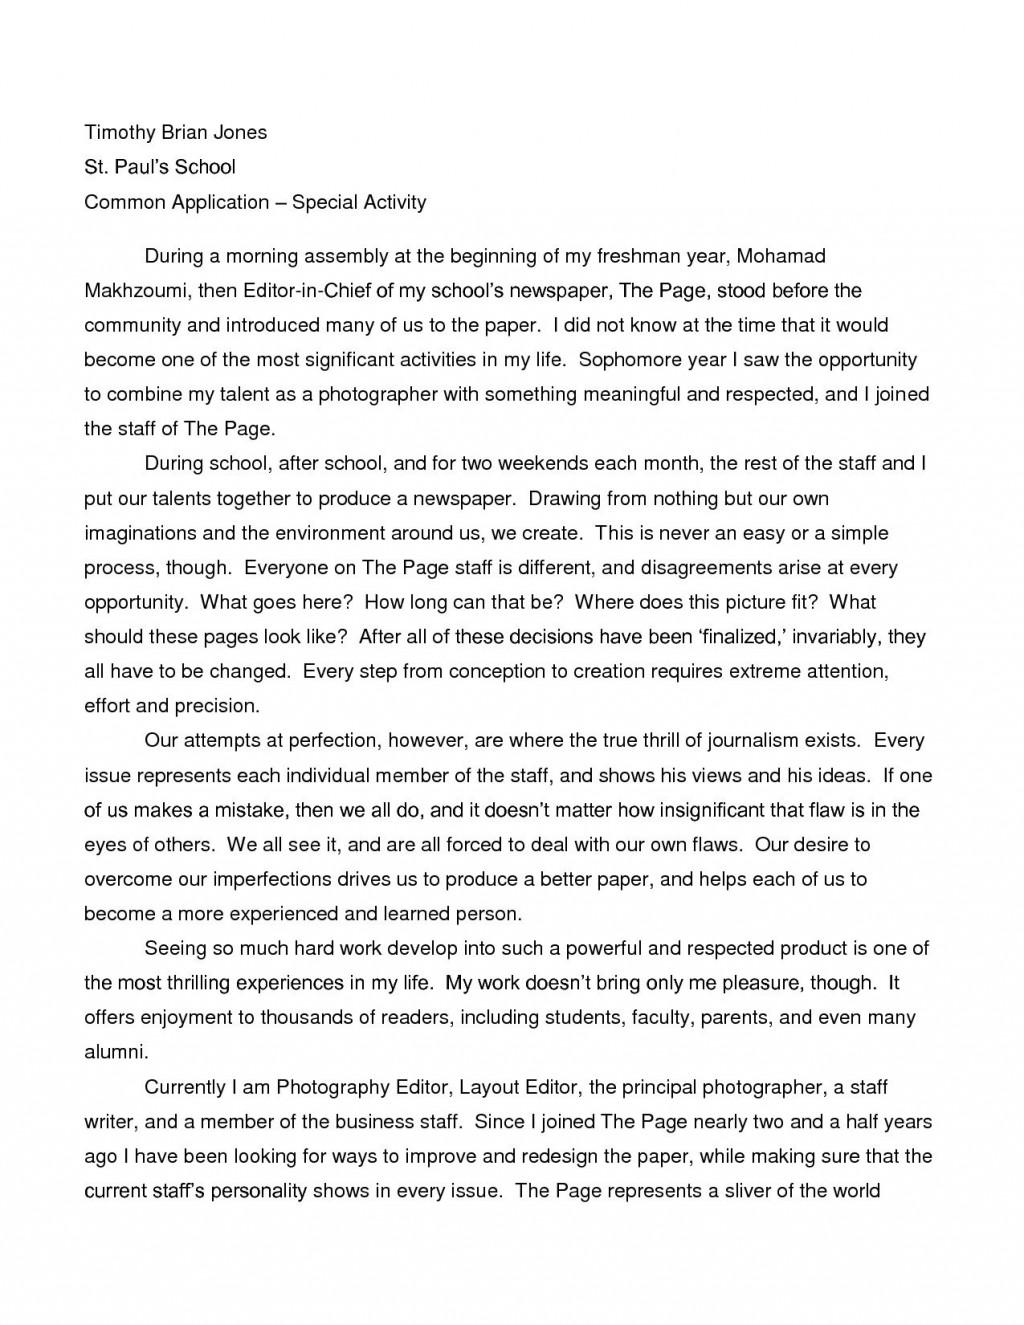 004 Informative Essays For High School Of Middle Mistyhamel Marvelous Essay Examples Pdf Large